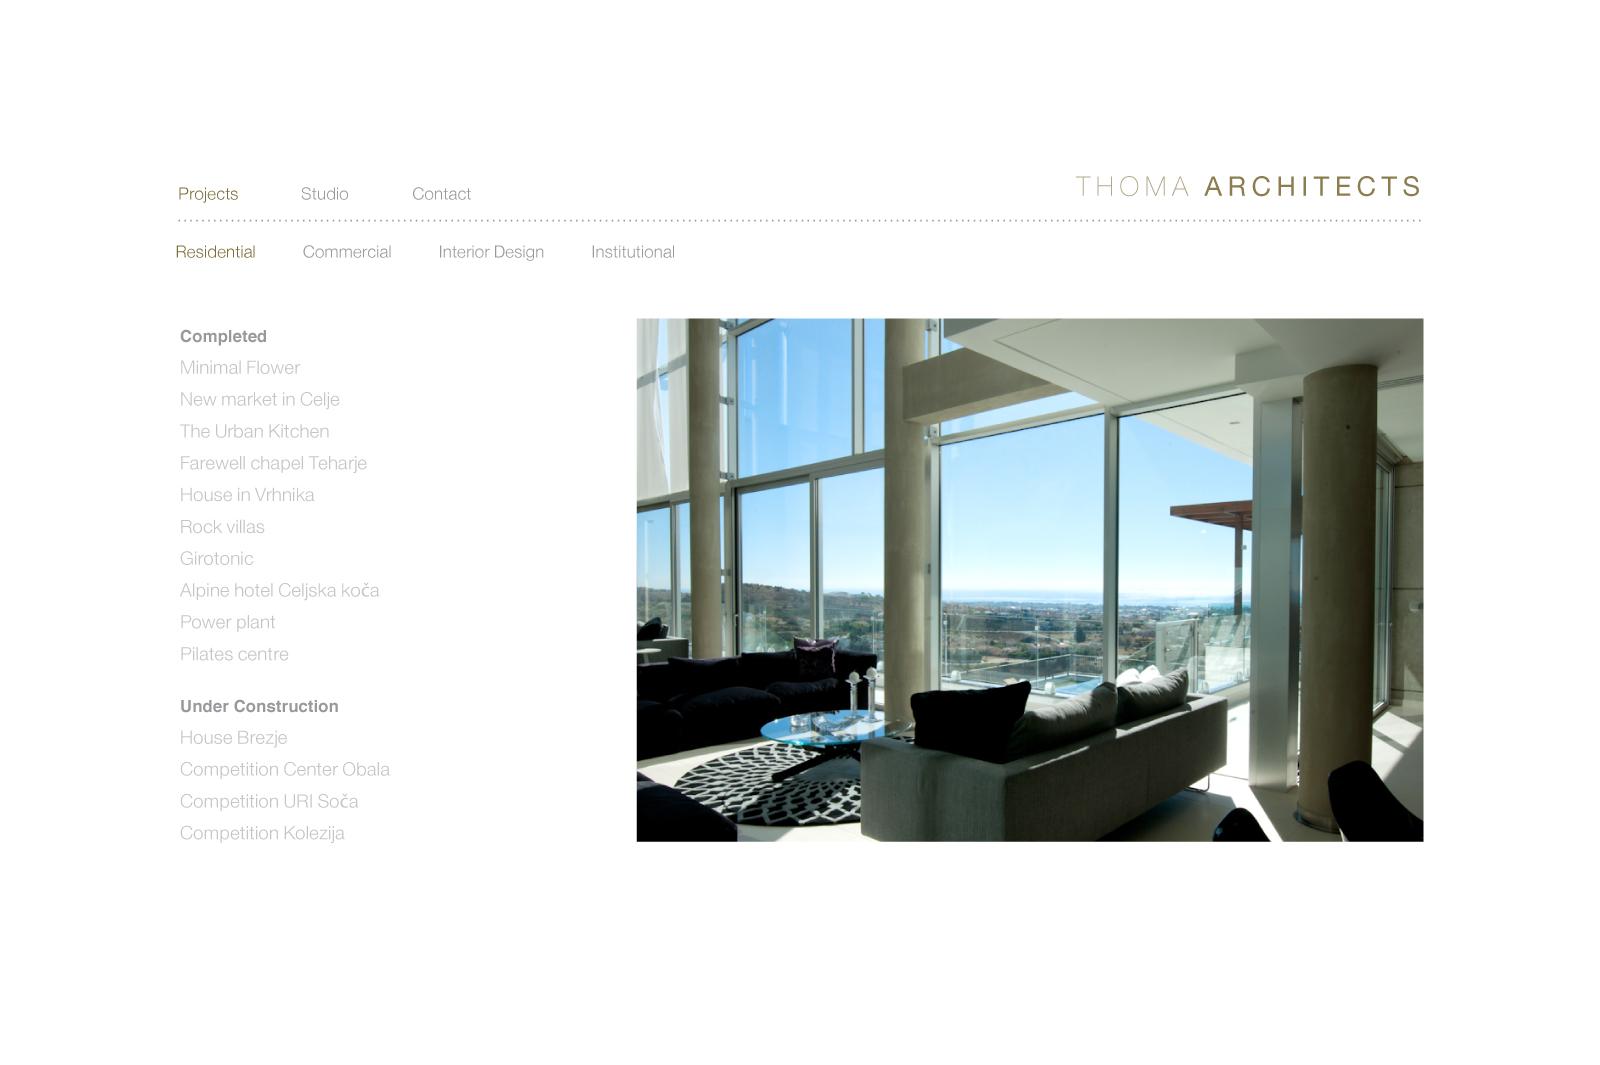 thoma_architect_05.jpg